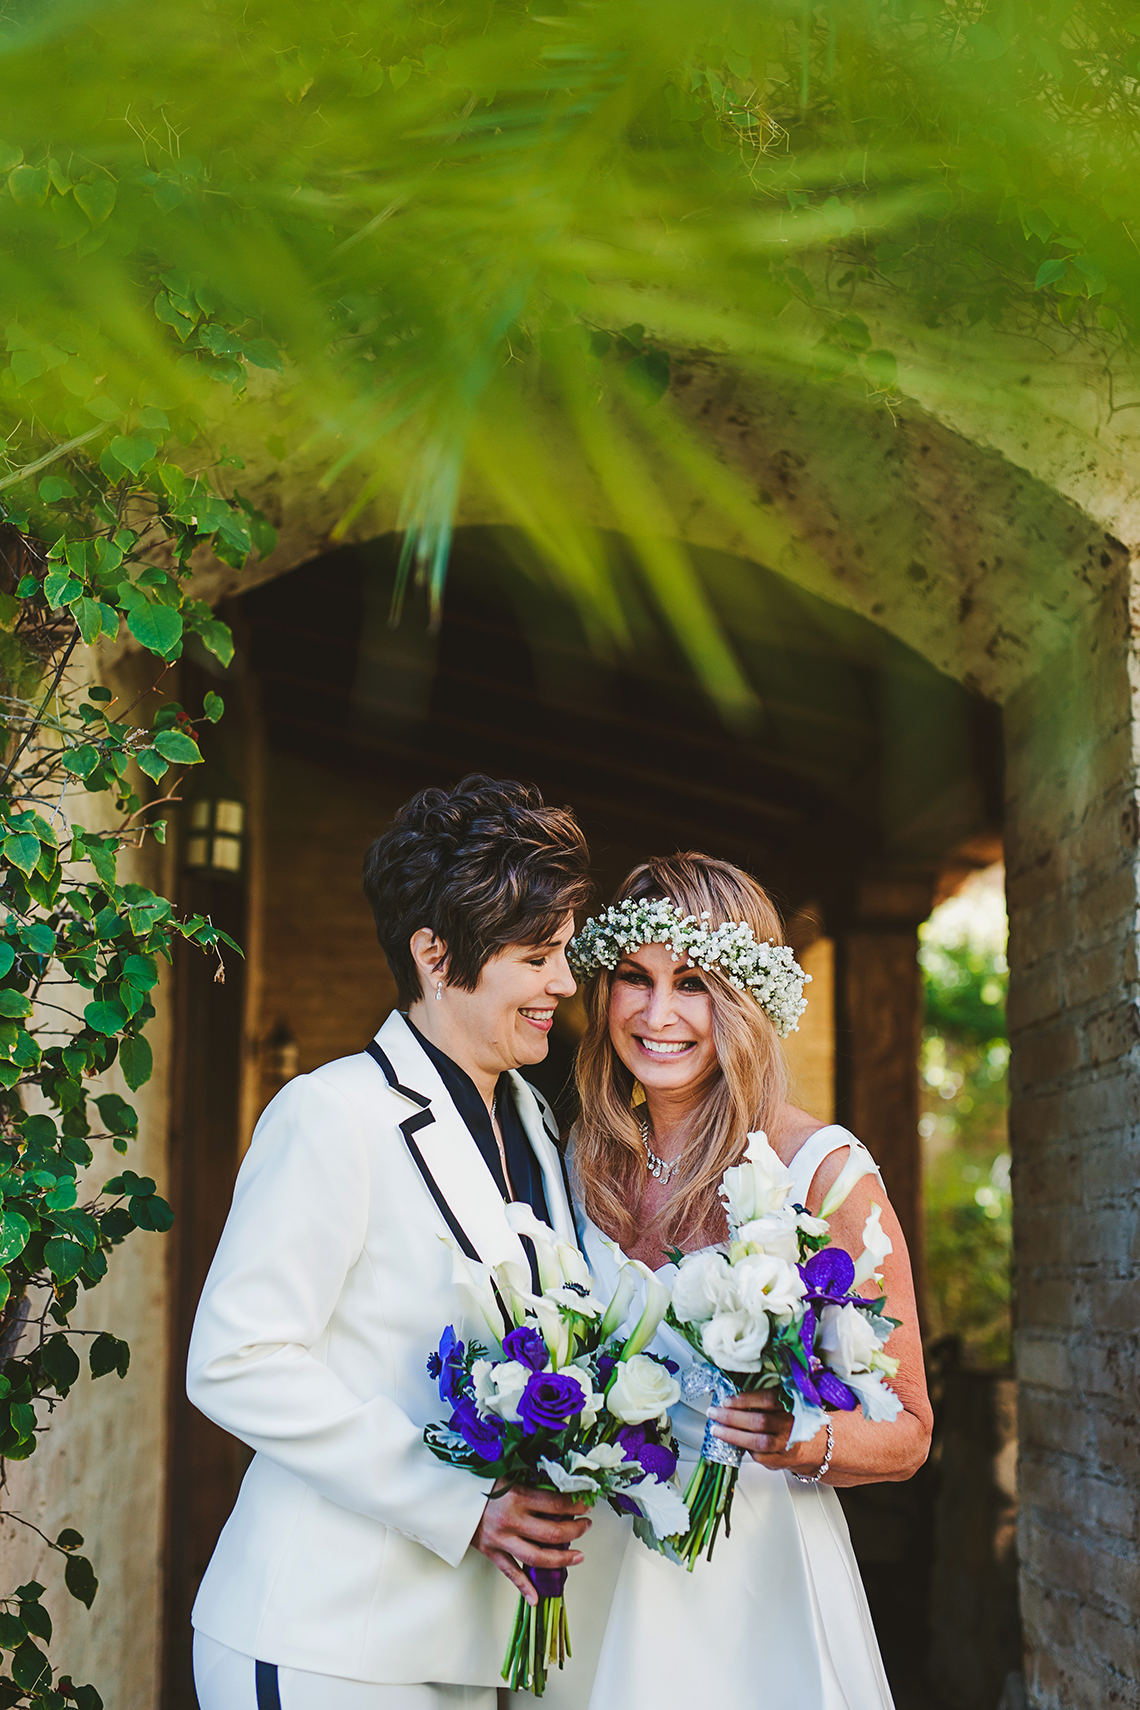 Stylish Same-Sex Palm Springs Wedding – Colony 29 – Ryan Horban Photography 19